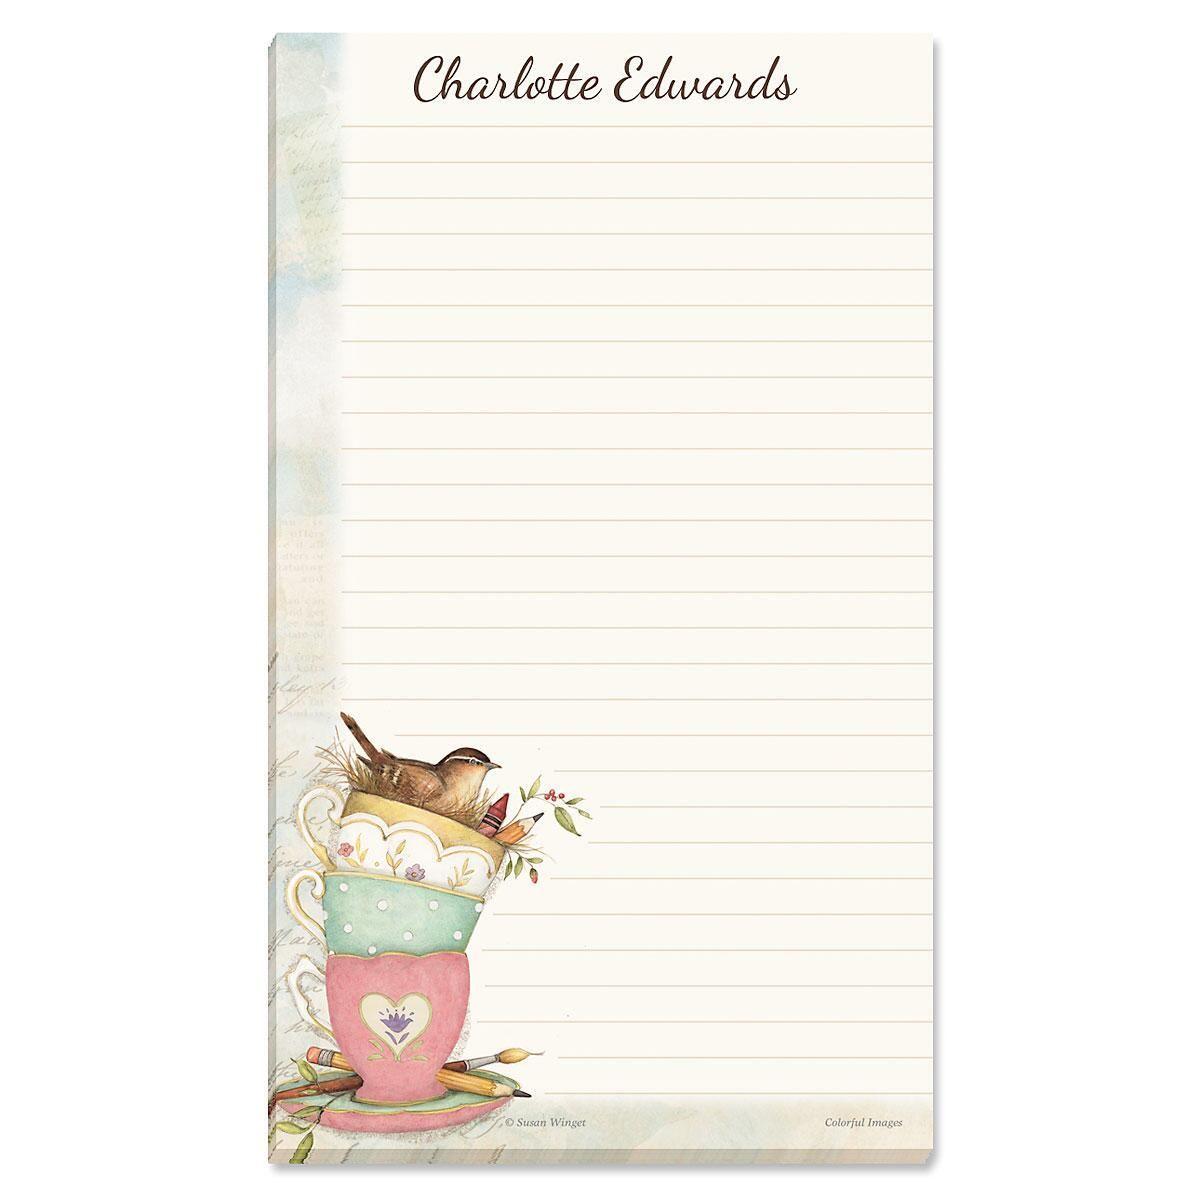 Teacup Notepad